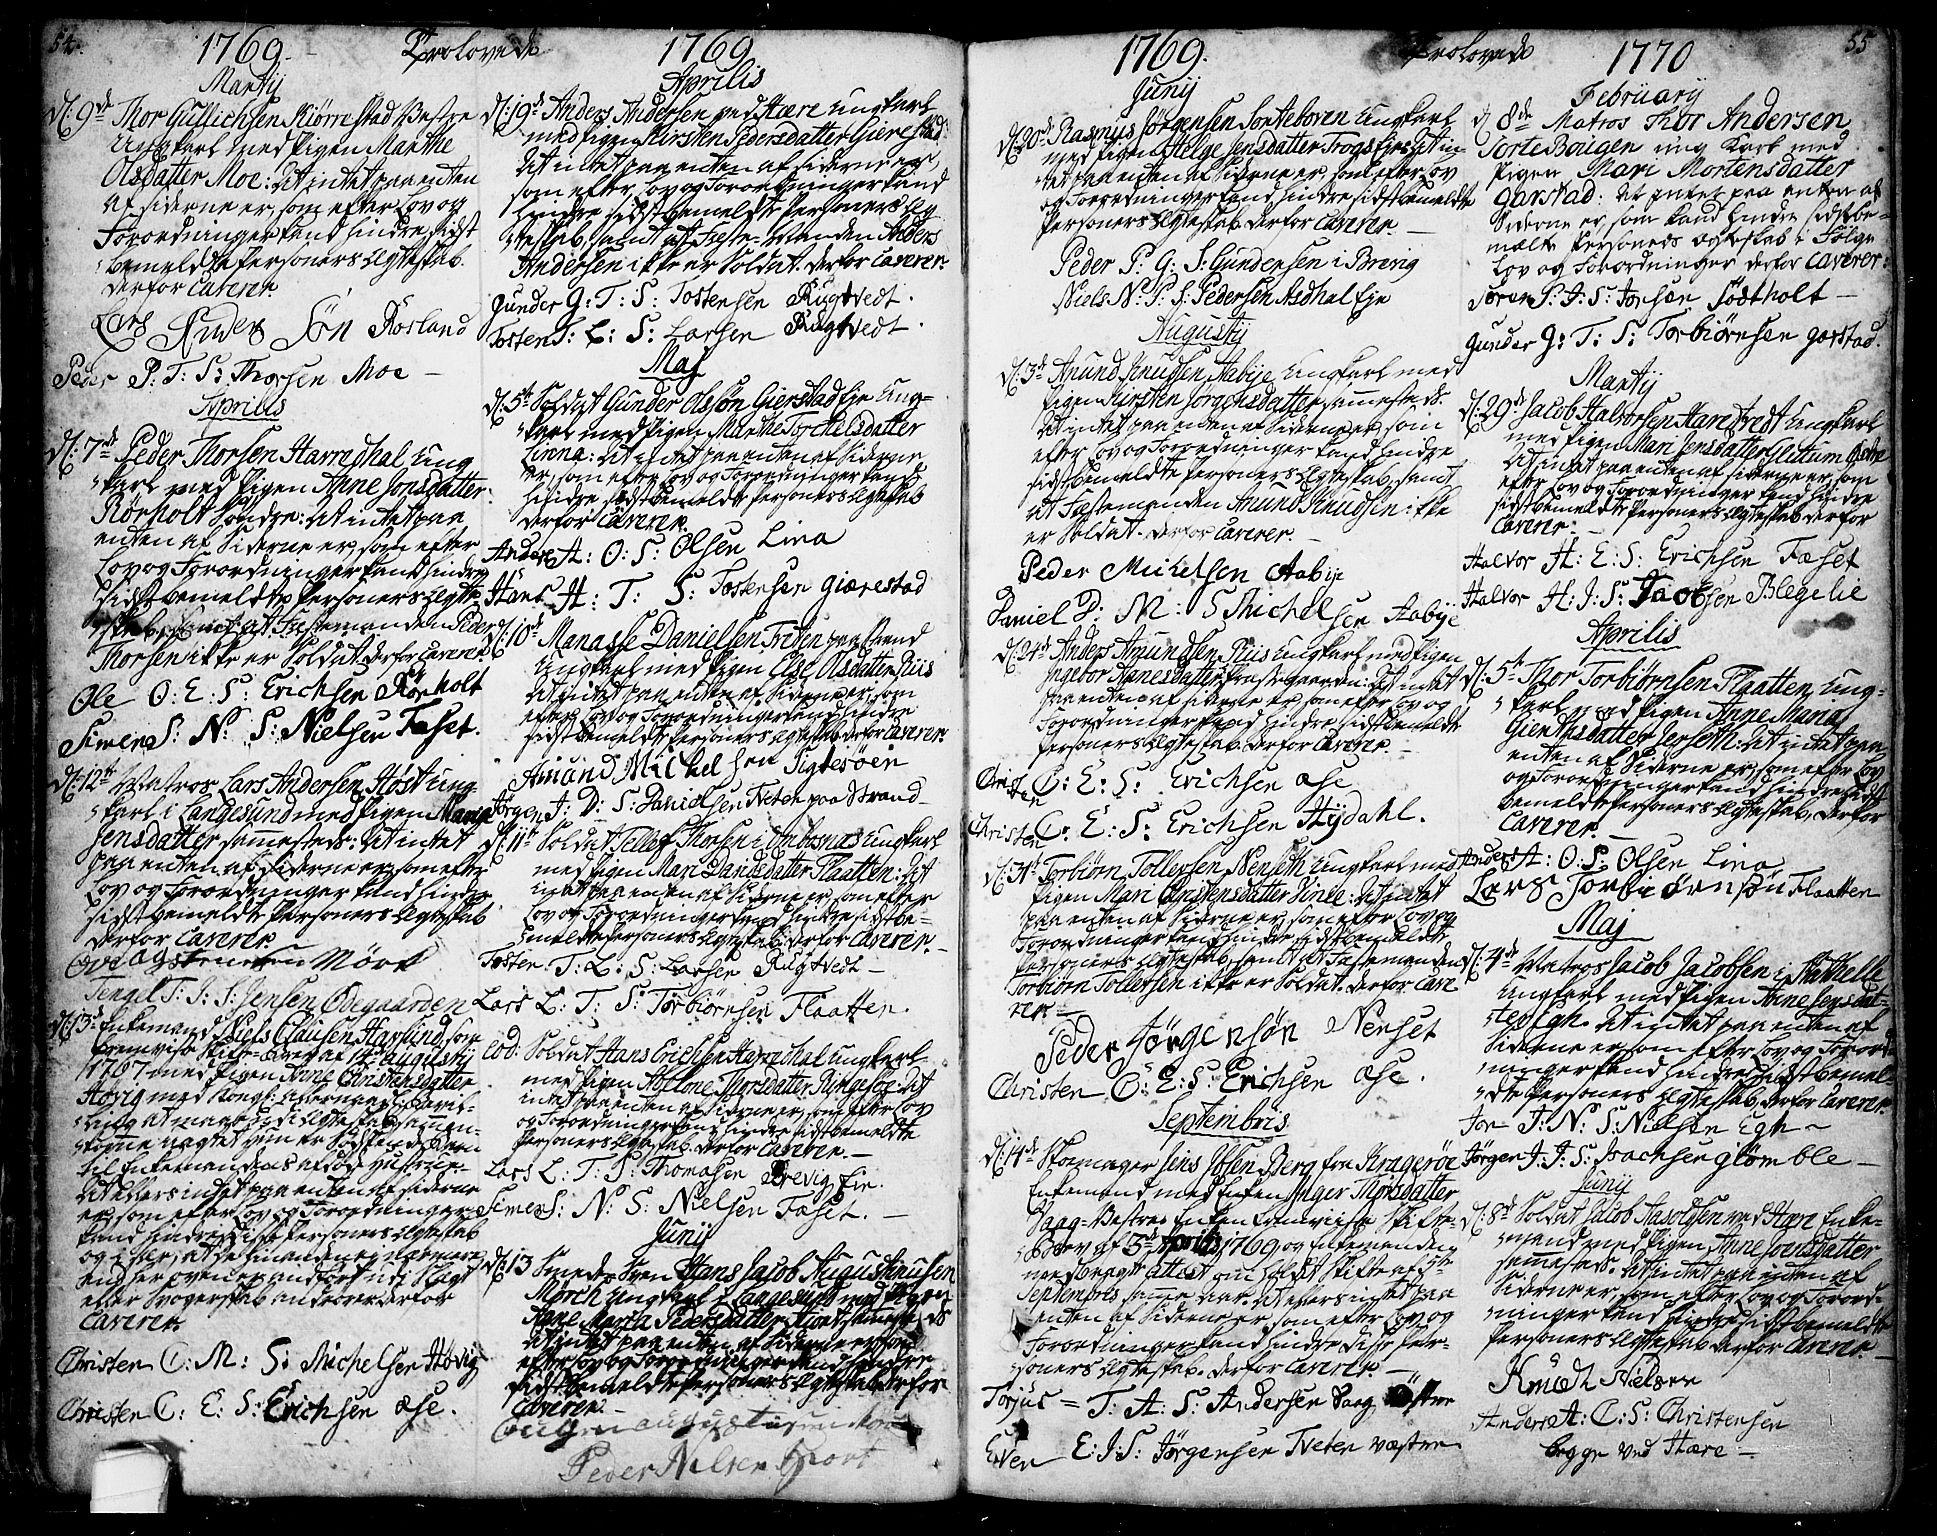 SAKO, Bamble kirkebøker, F/Fa/L0001: Ministerialbok nr. I 1, 1702-1774, s. 54-55